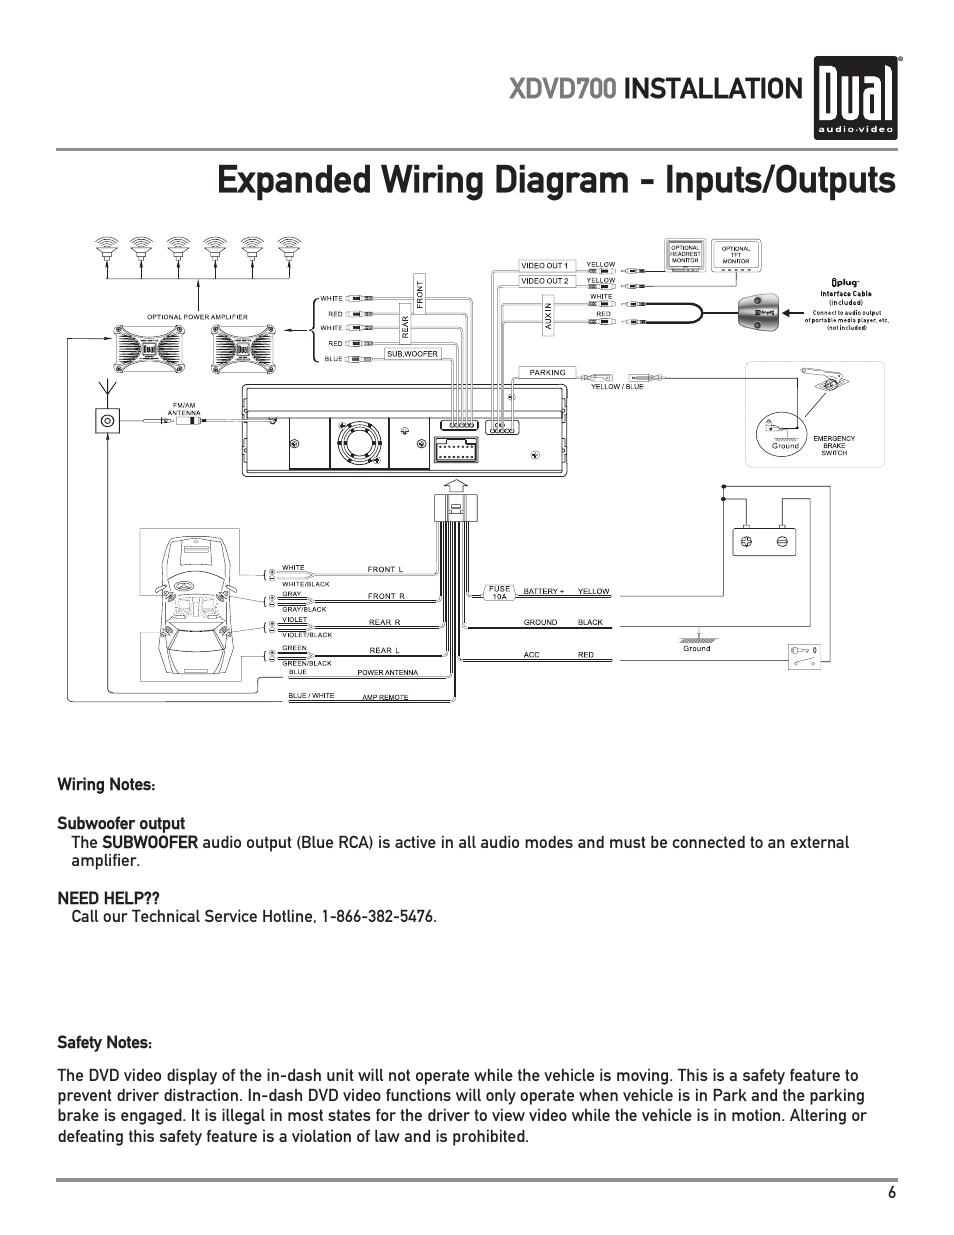 Dual Xd1228 Wiring Diagram | #1 Wiring Diagram Source on